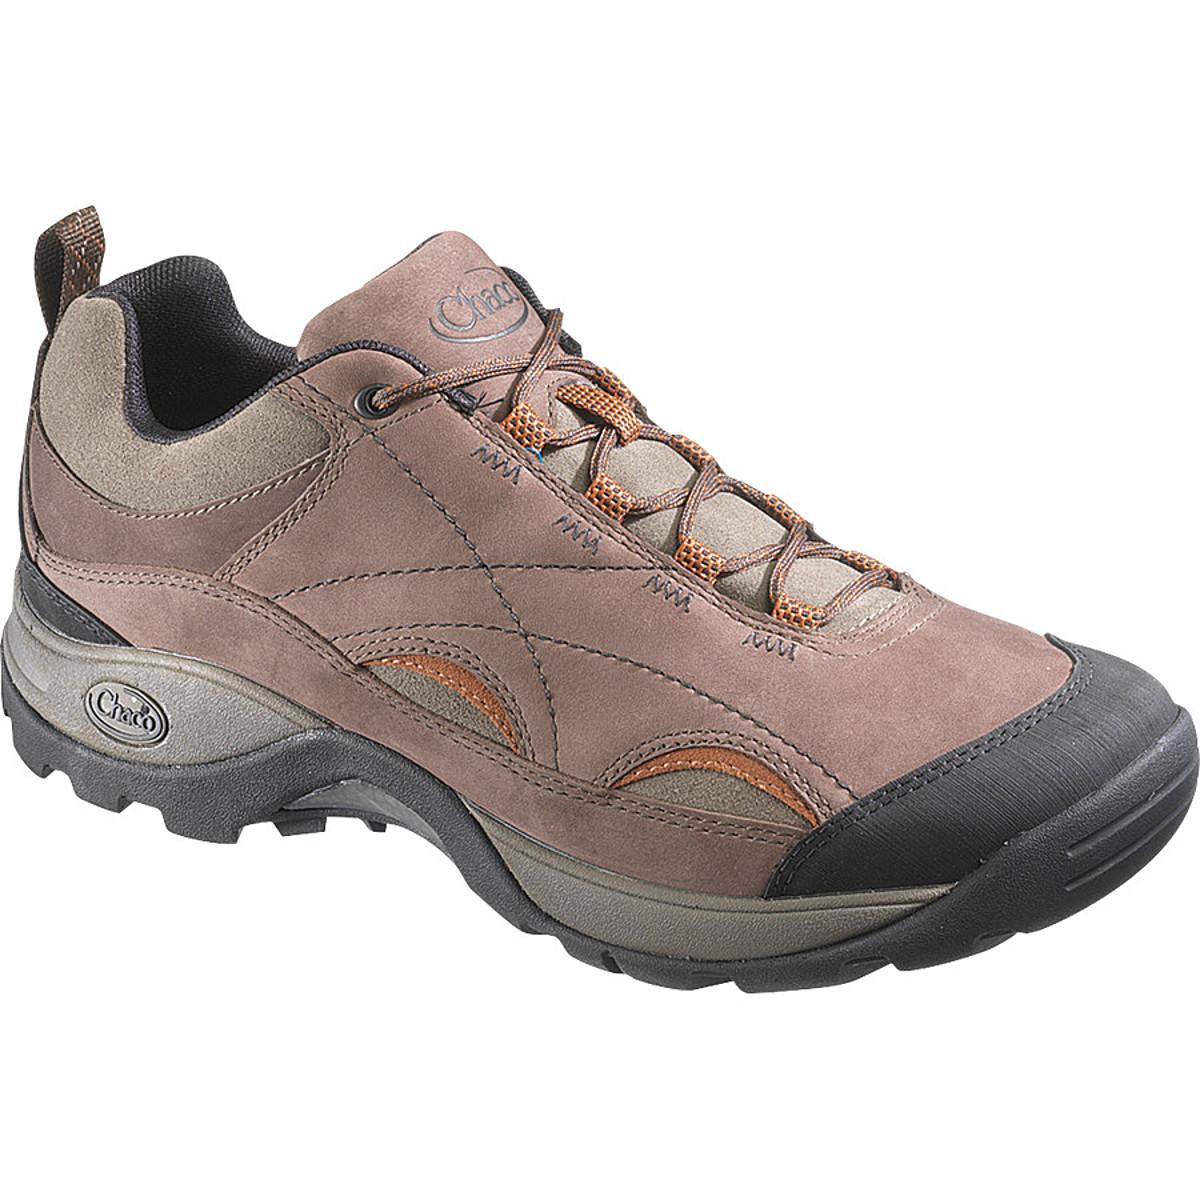 Chaco Hinterland Shoe